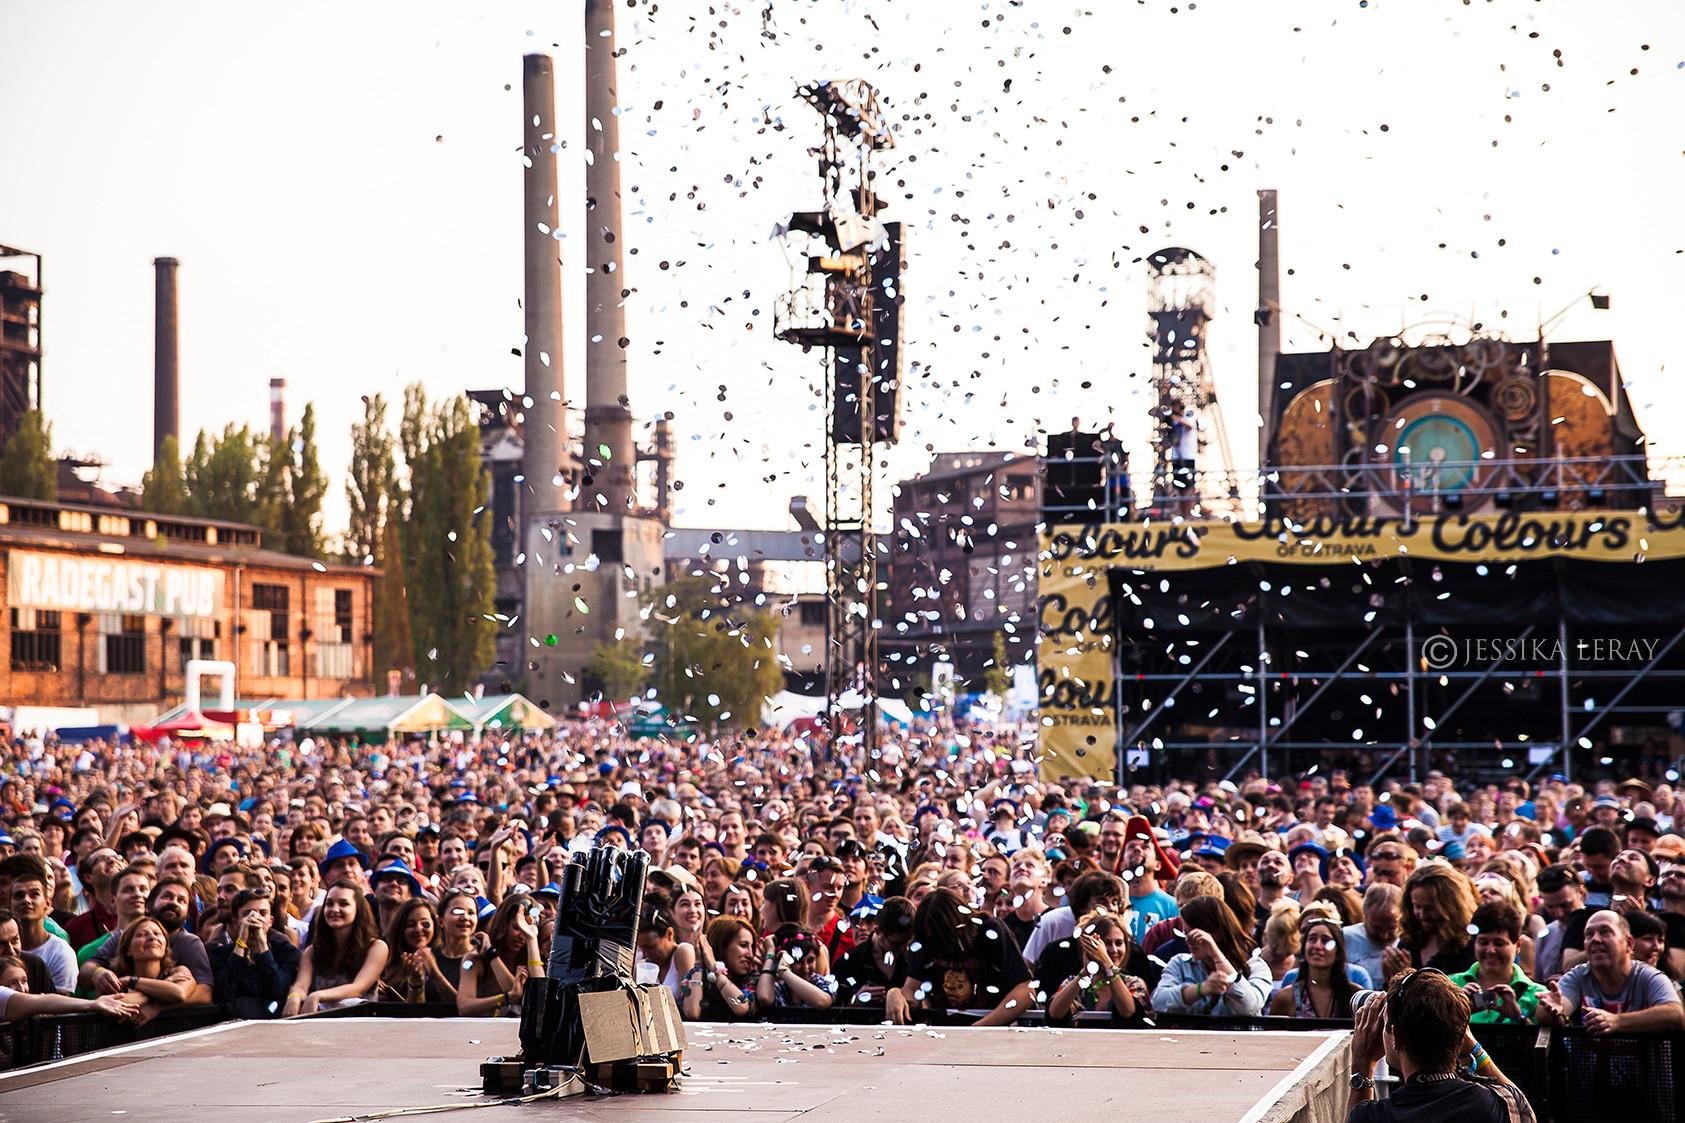 Ostrava2014-22fbk.jpg